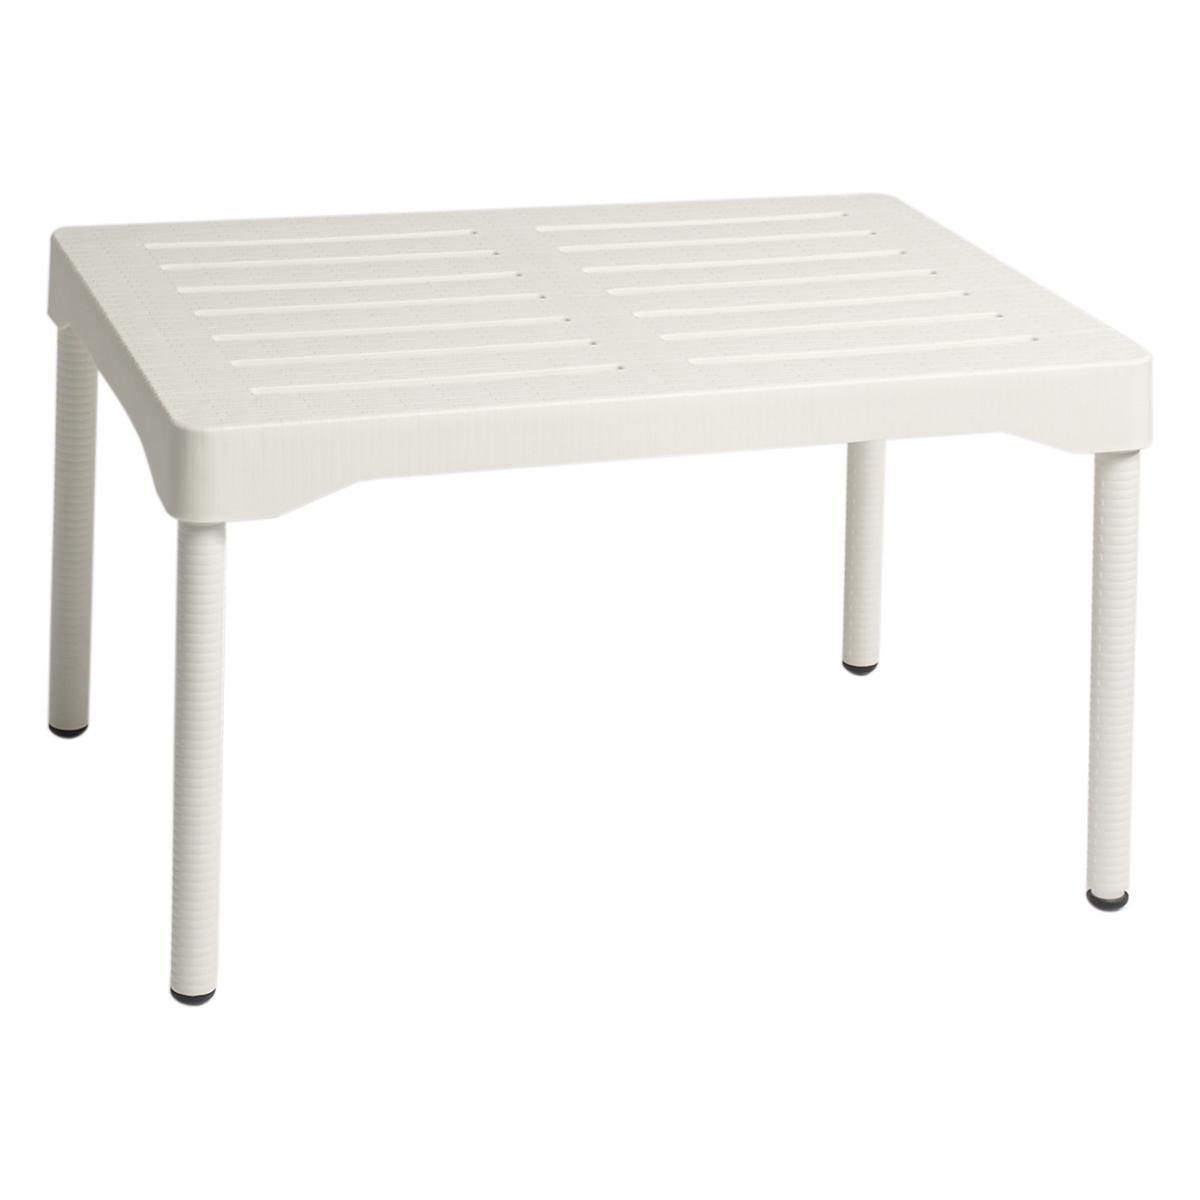 Astonishing White Julie Low Table Internation Moduling Uwap Interior Chair Design Uwaporg